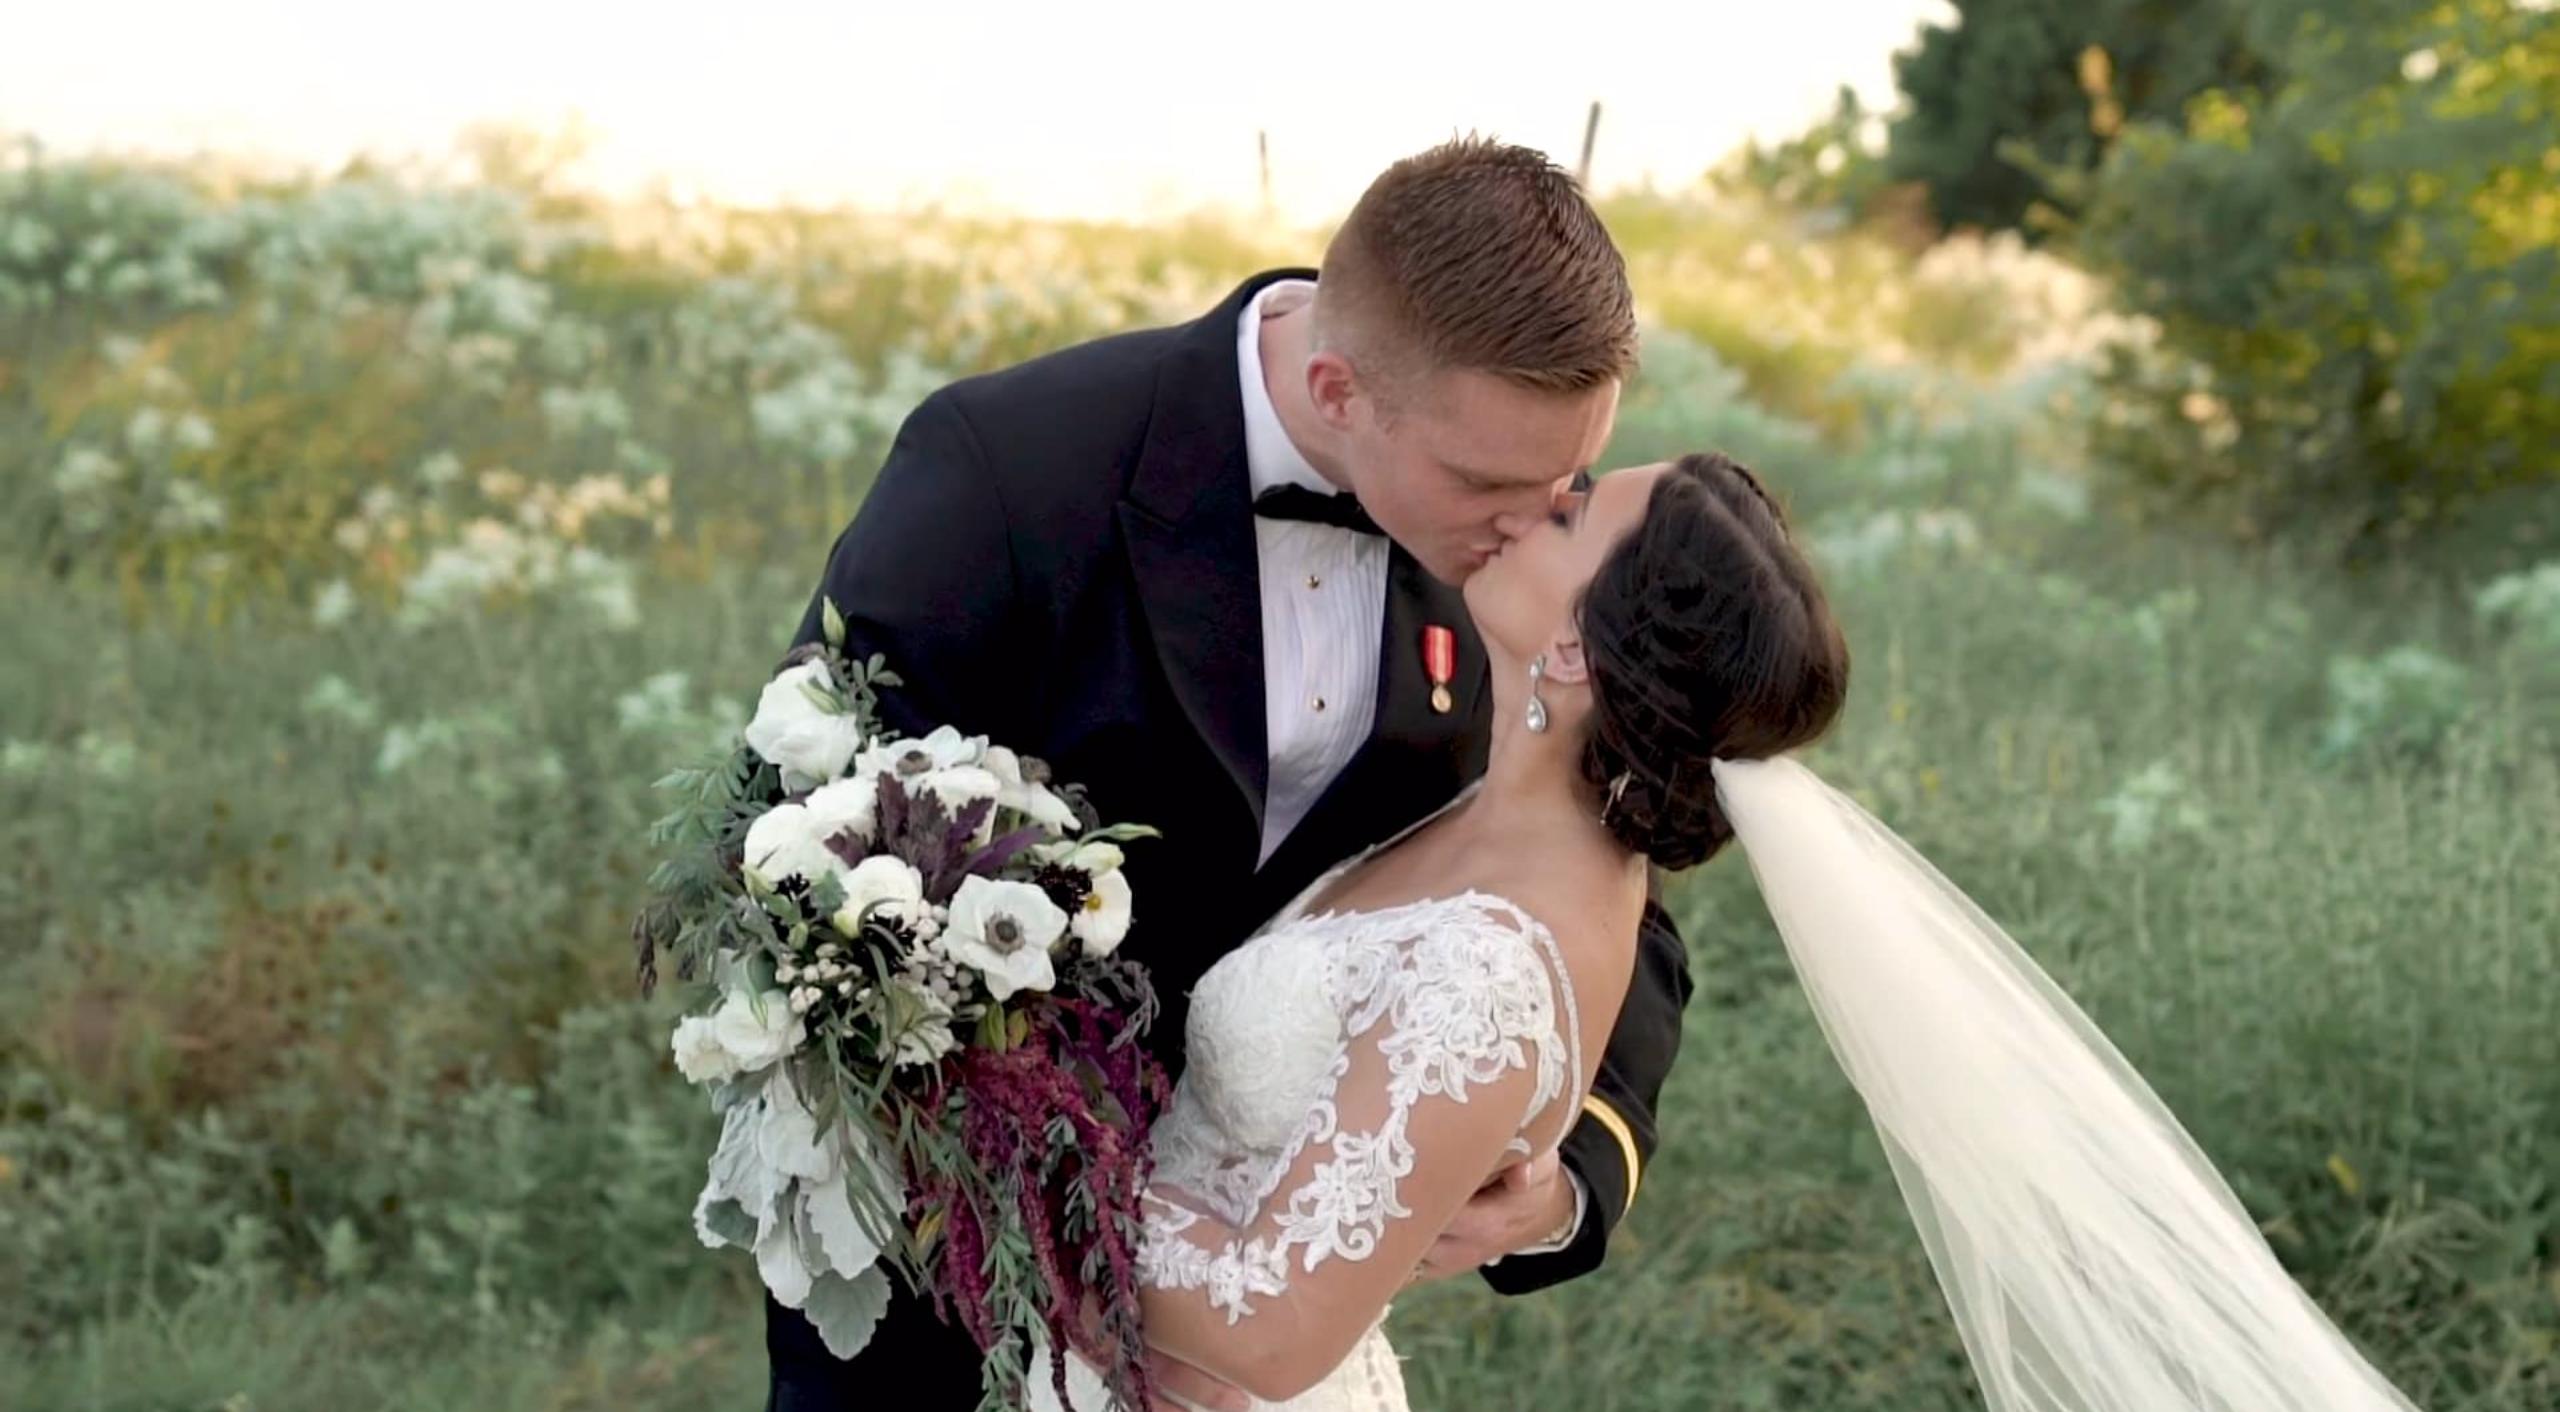 Lauren + Corey | Leonard, Texas | The Grand Ivory